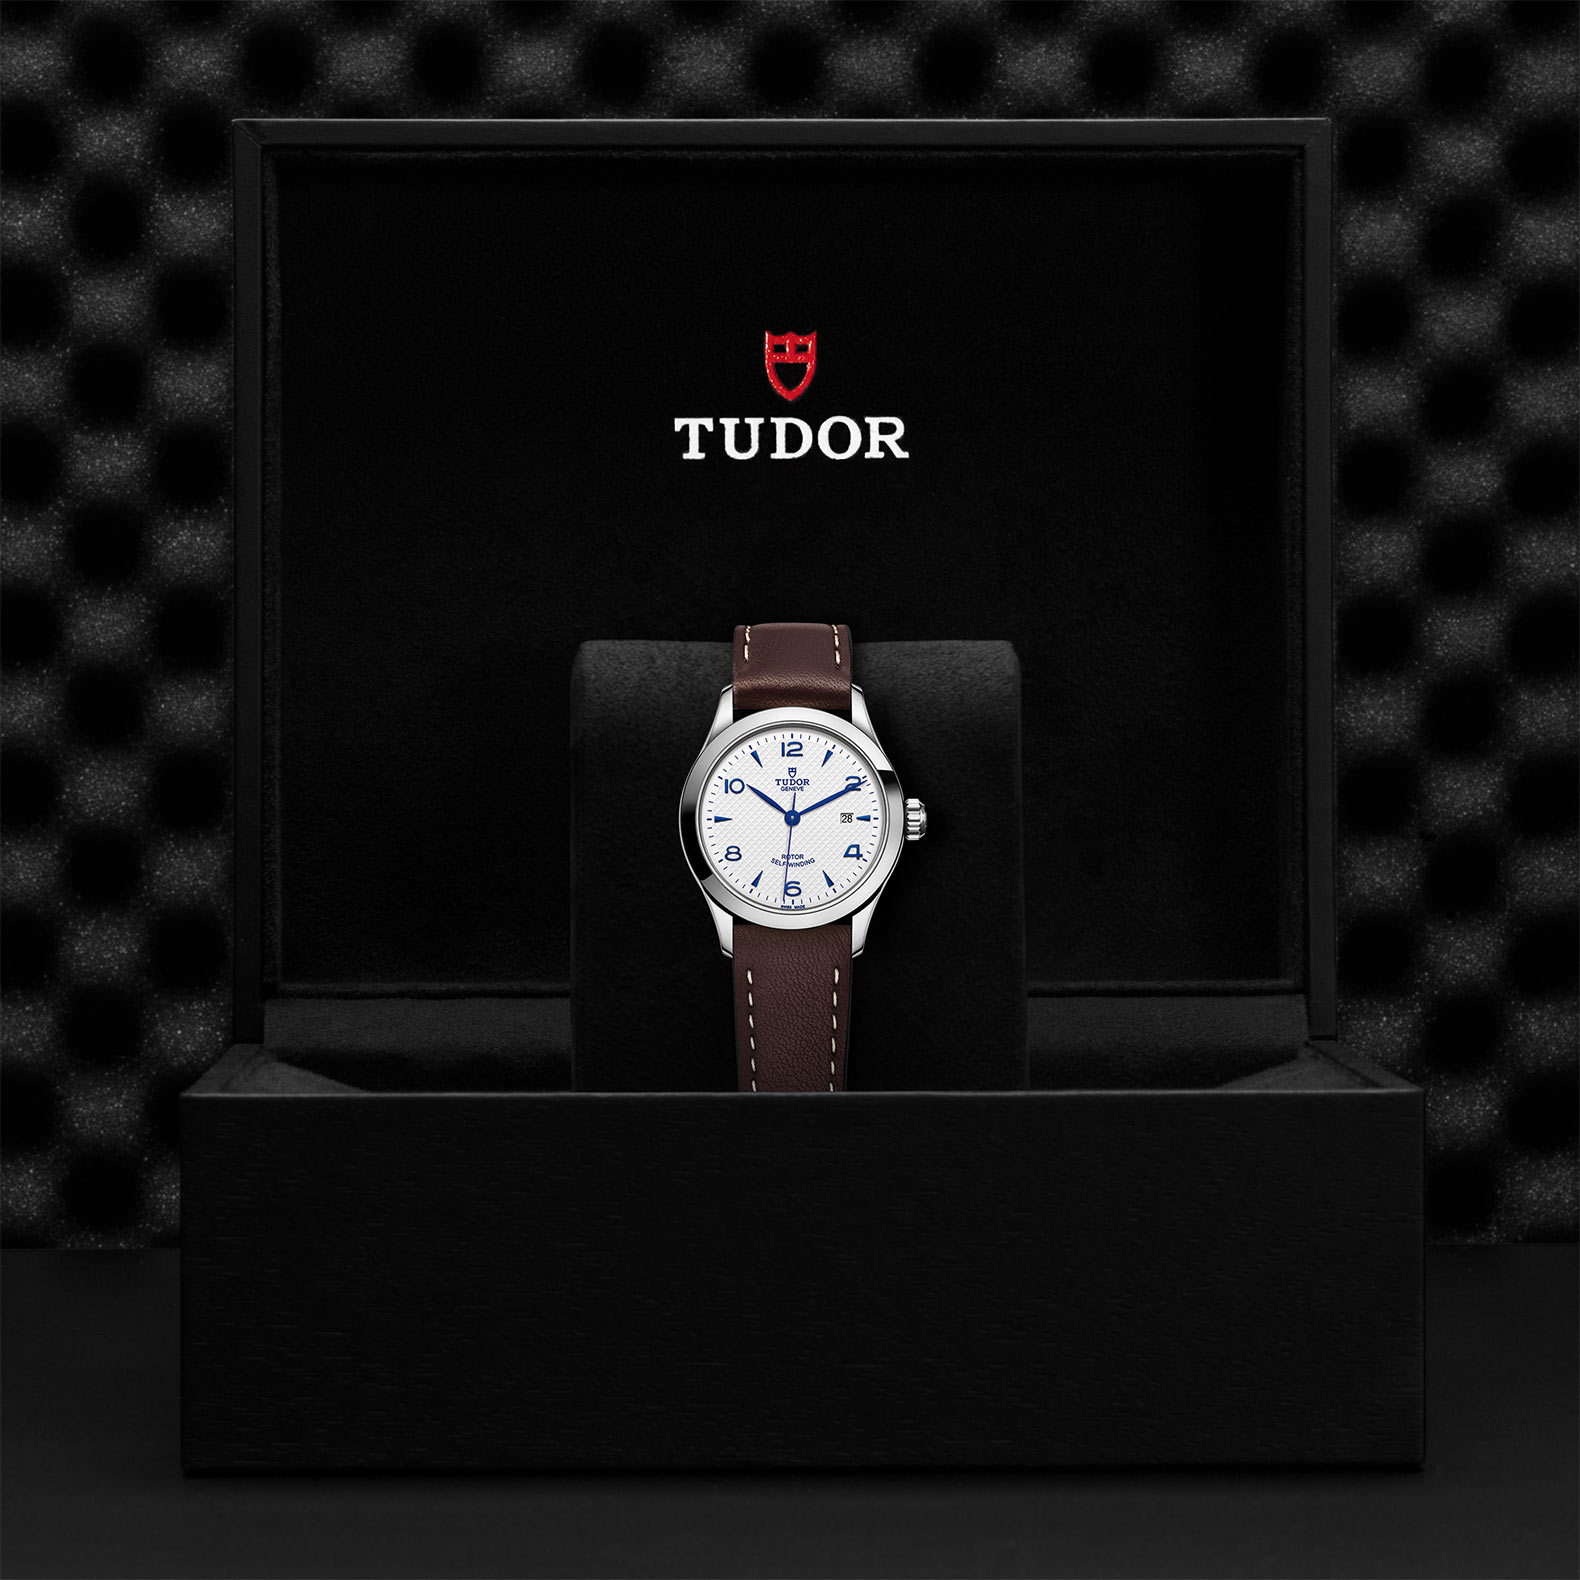 TUDOR 1926 - M91350-0010